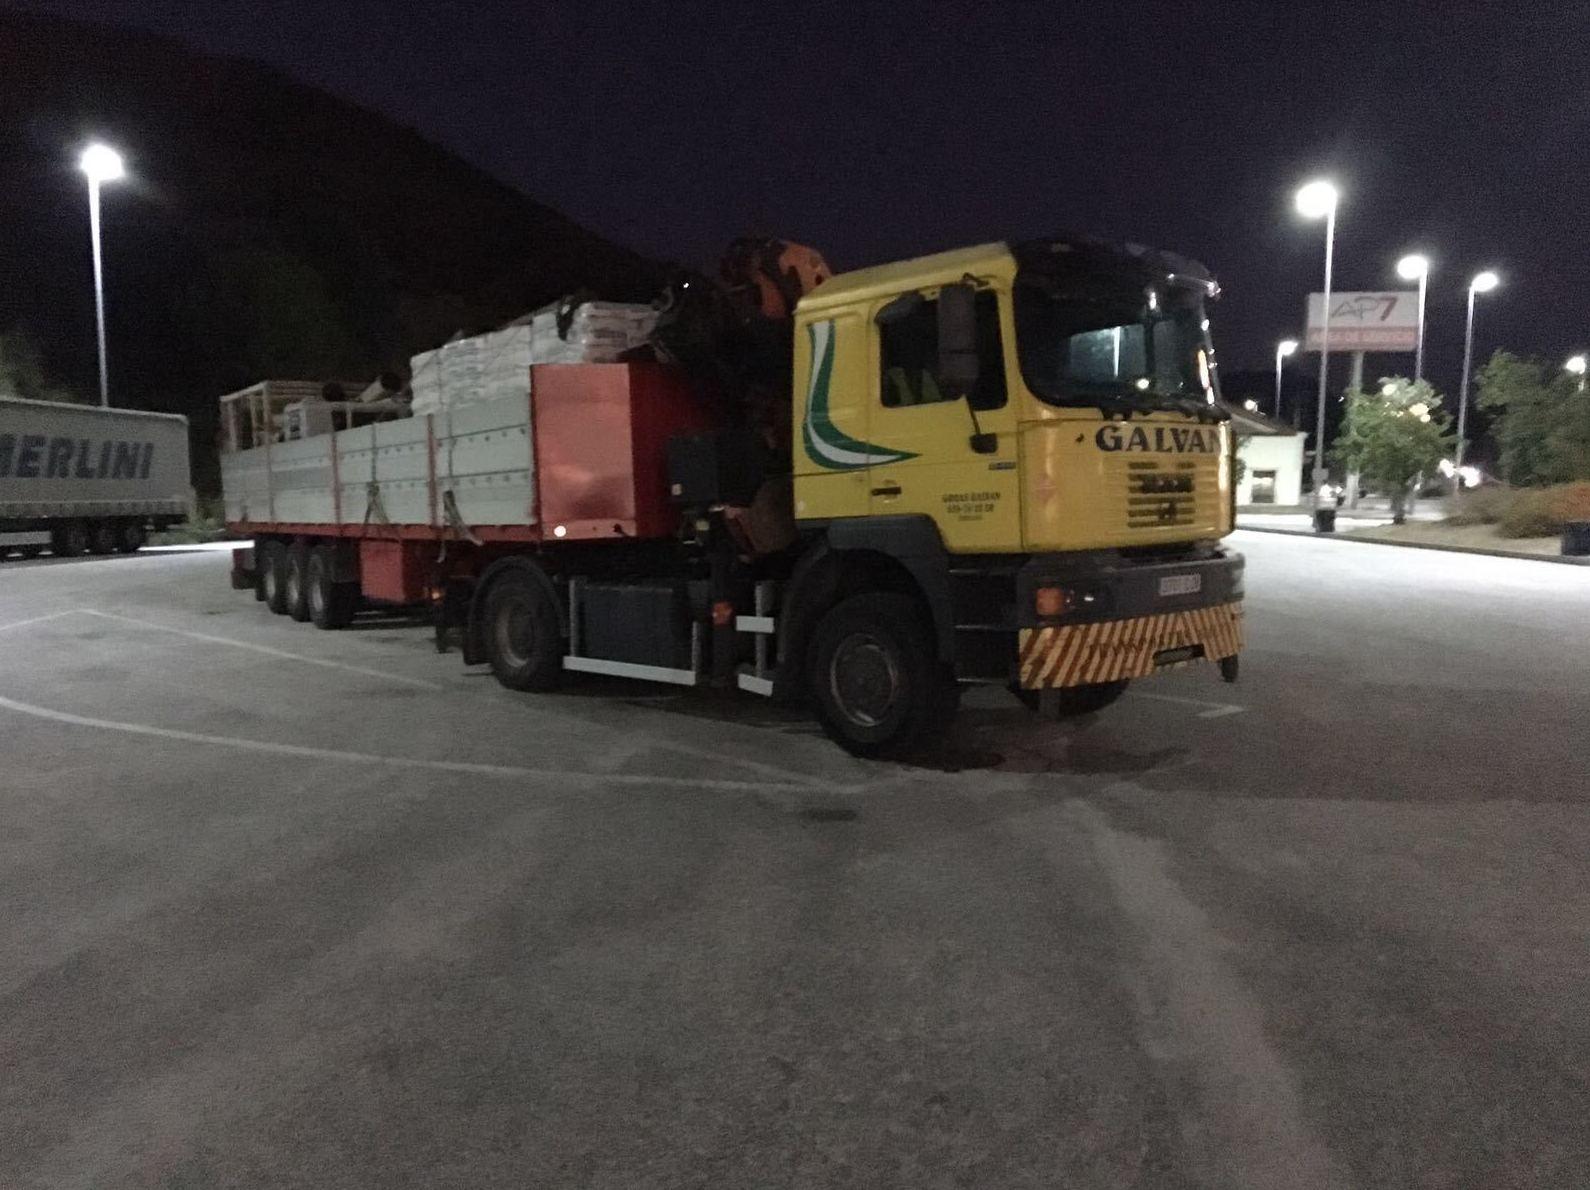 Camión grúa: Servicios de Transportes y Grúas Galván - Alquileres Galván